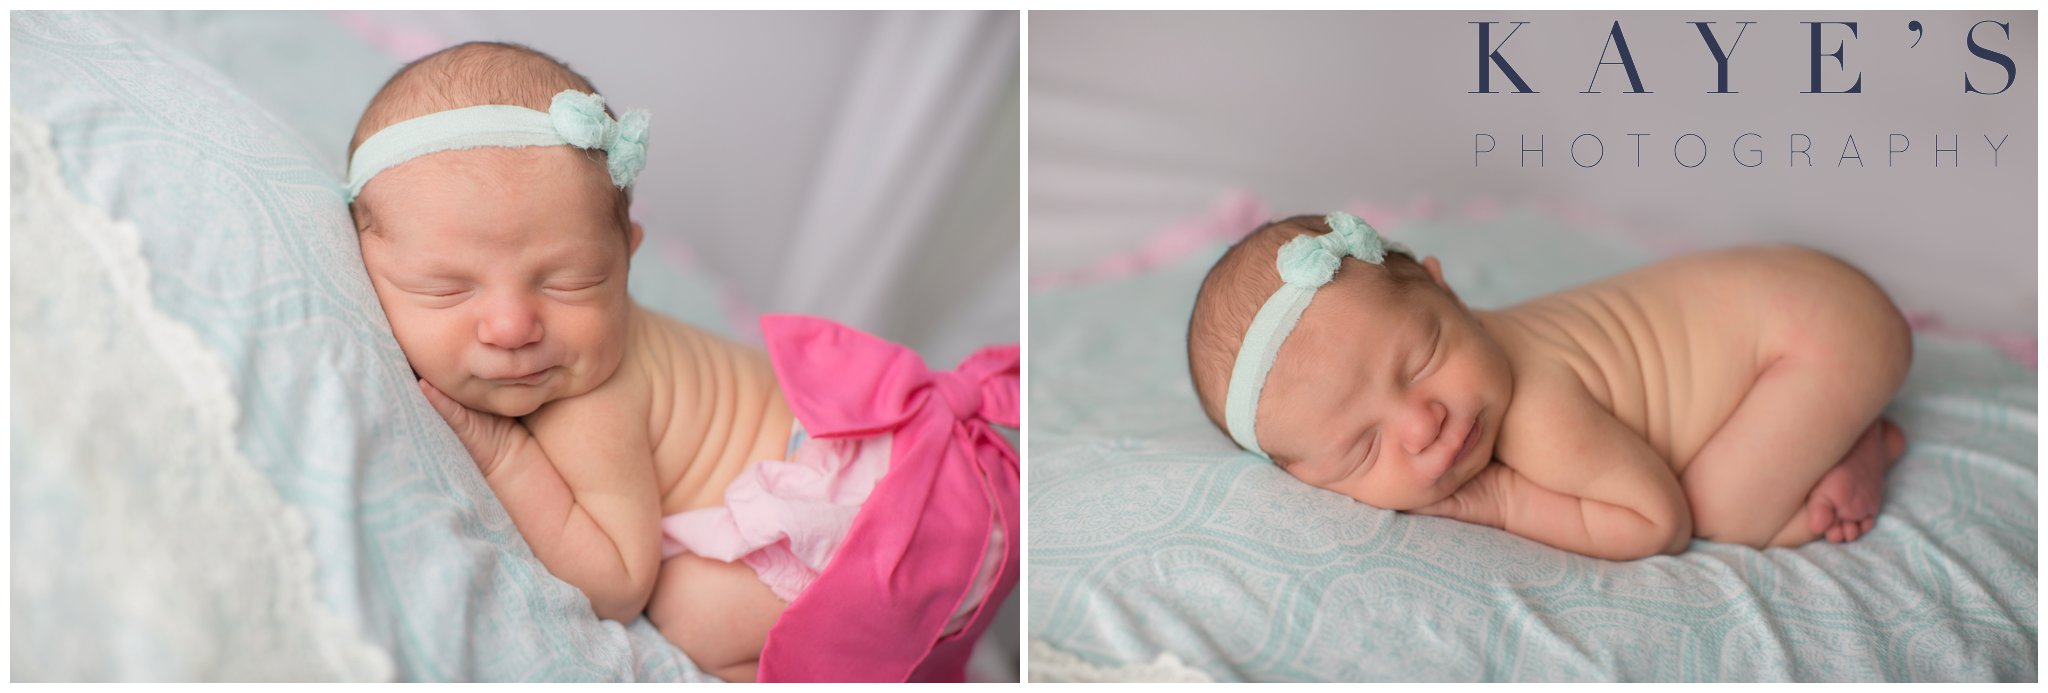 Celebrity newborn girl in studio on blue blanket wearing headband and pink bow